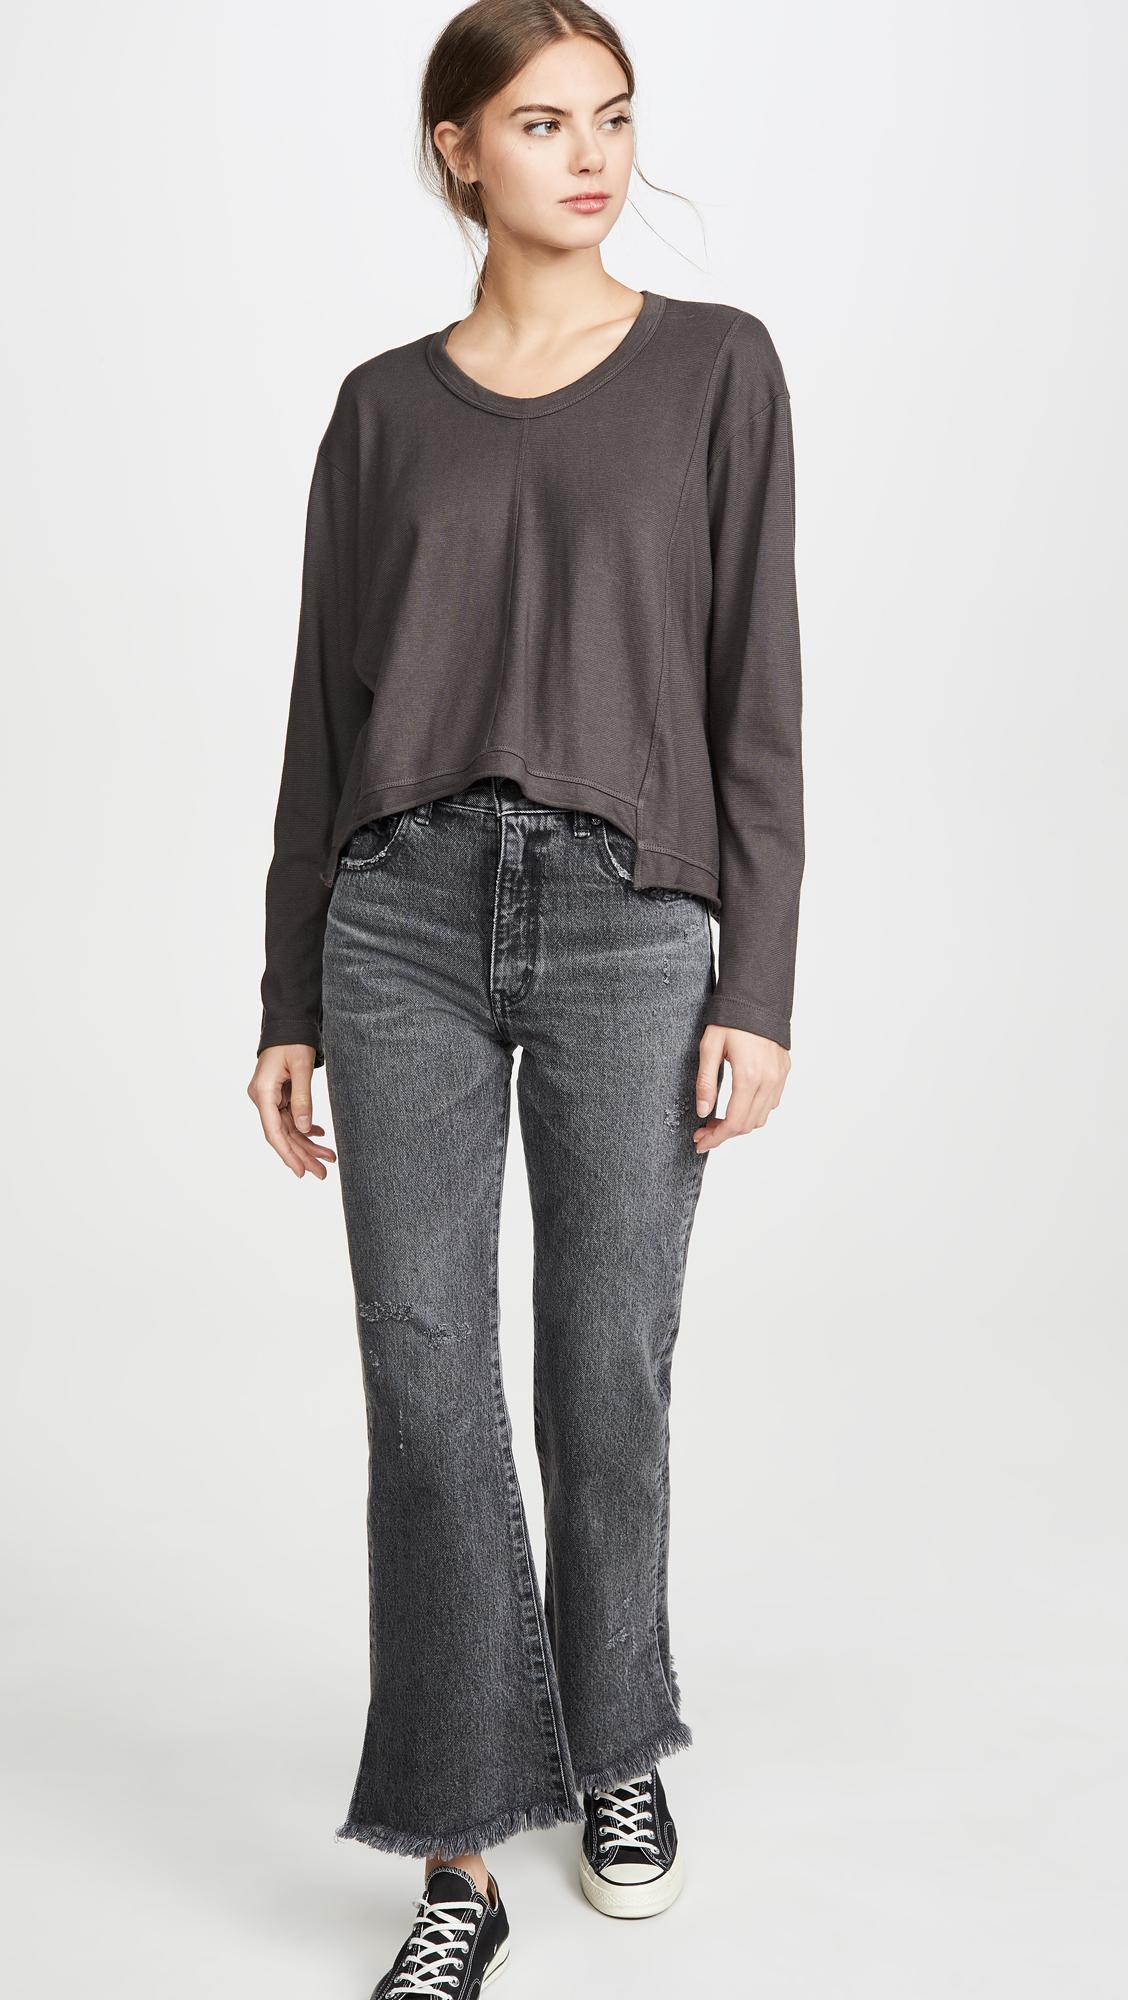 Wilt Womens Big Seam Shifted Sweatshirt